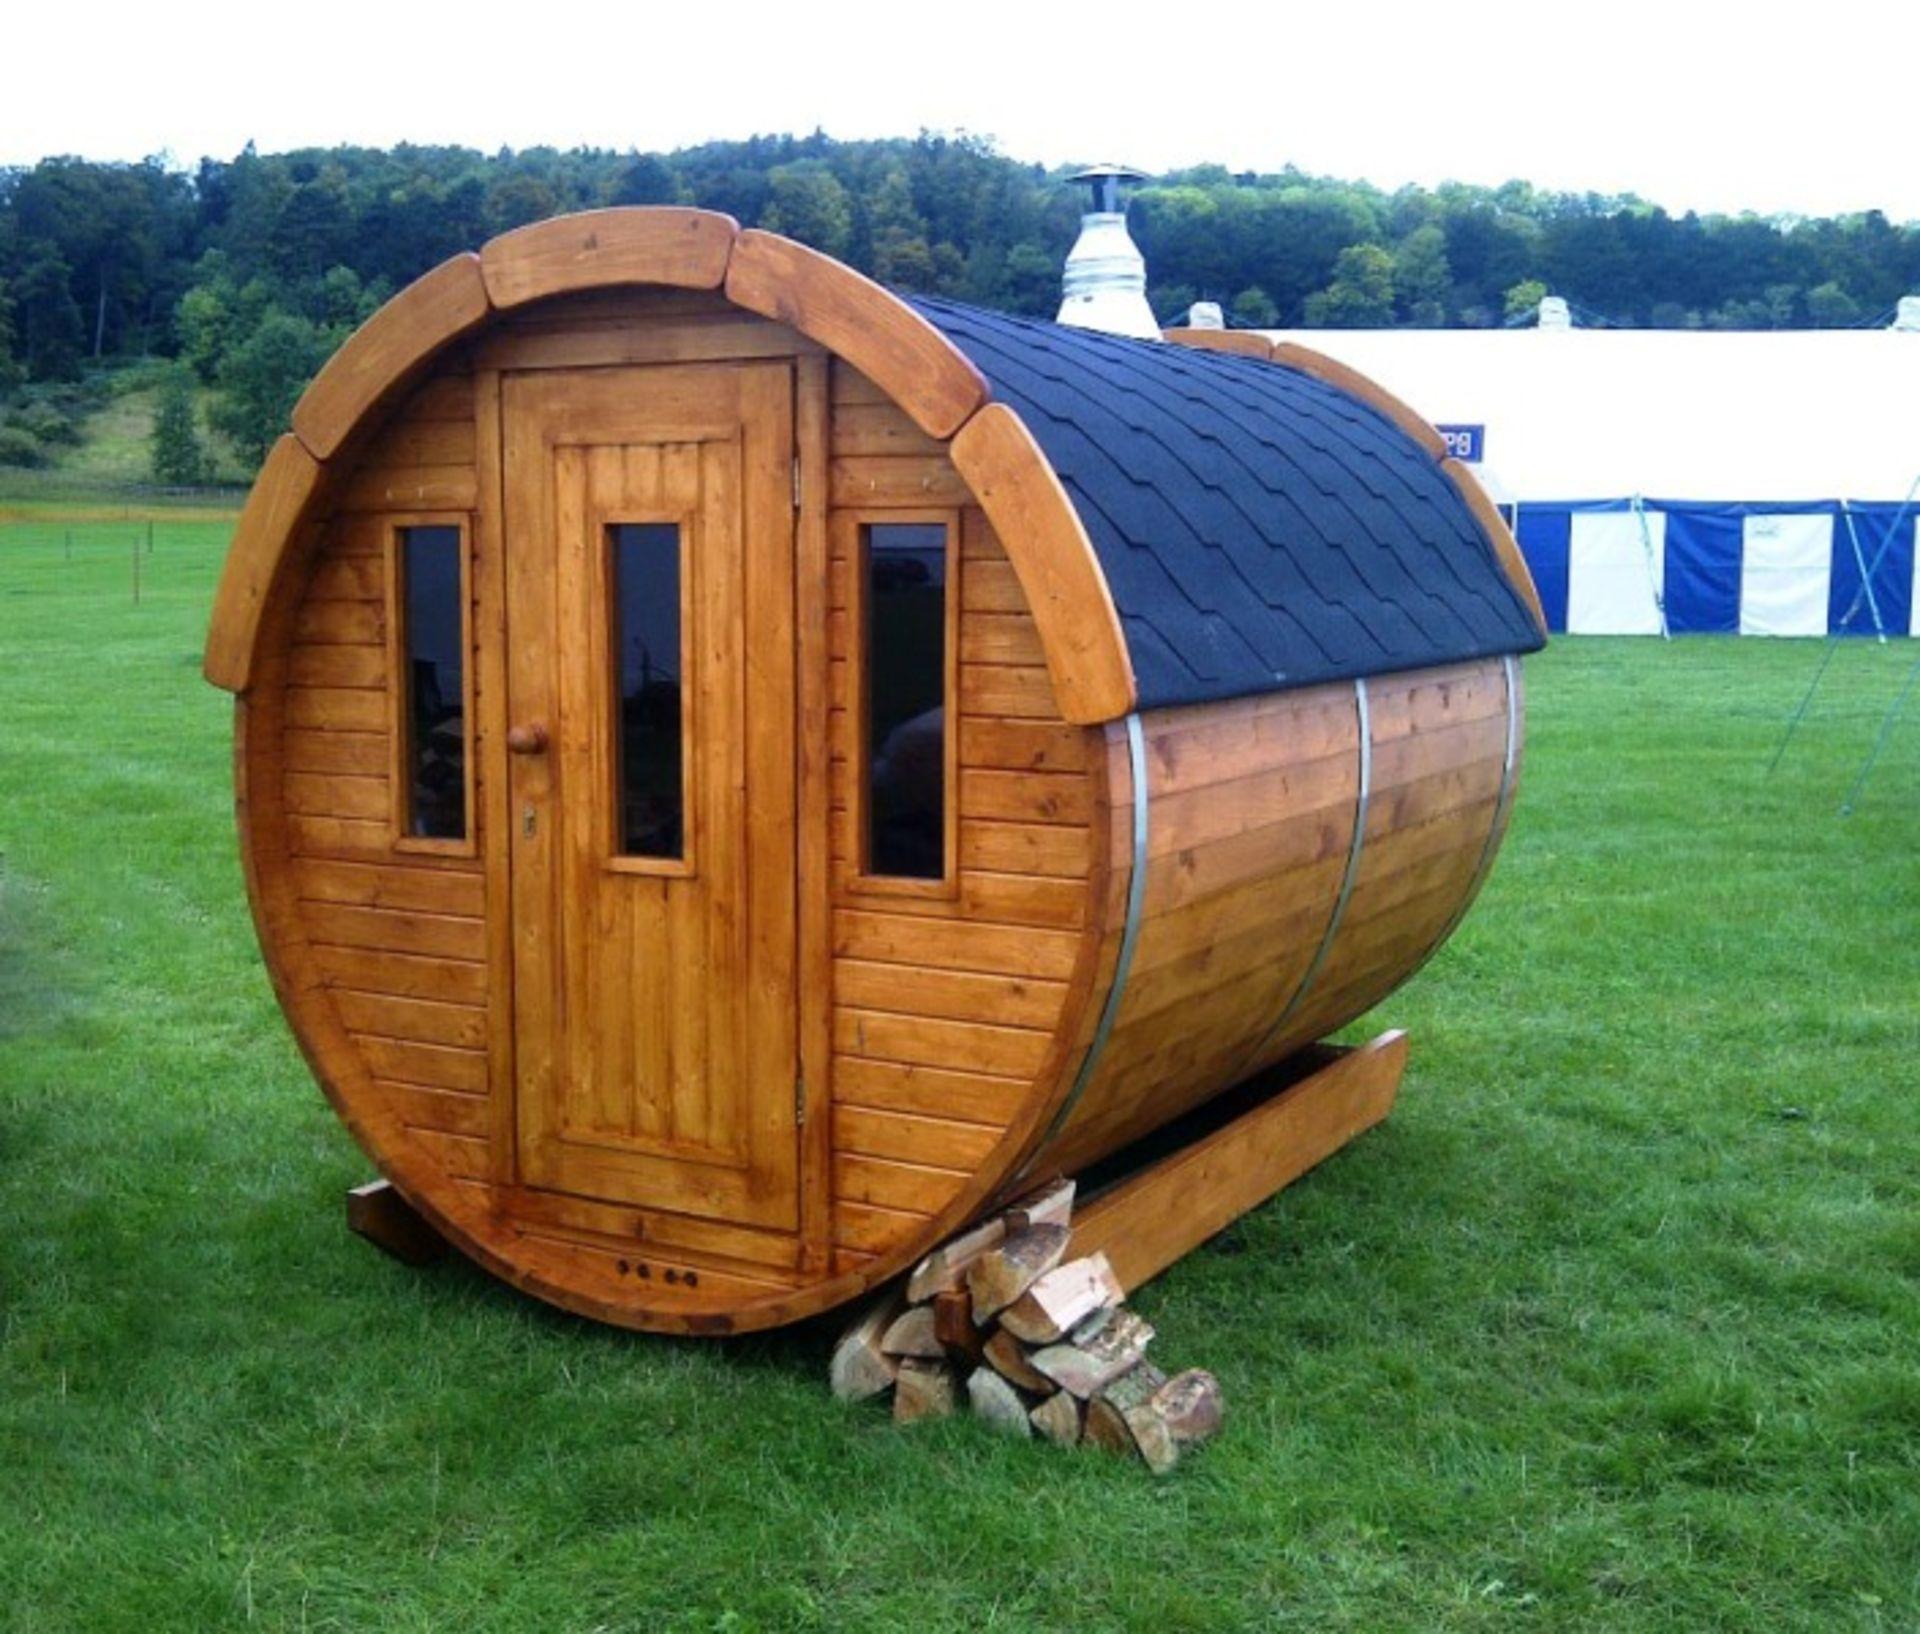 Lot 18000 - V Brand New Superb 2m Garden Sauna Barrel *FULLY ASSEMBLED* - Powerful Harvia Electric Heater -